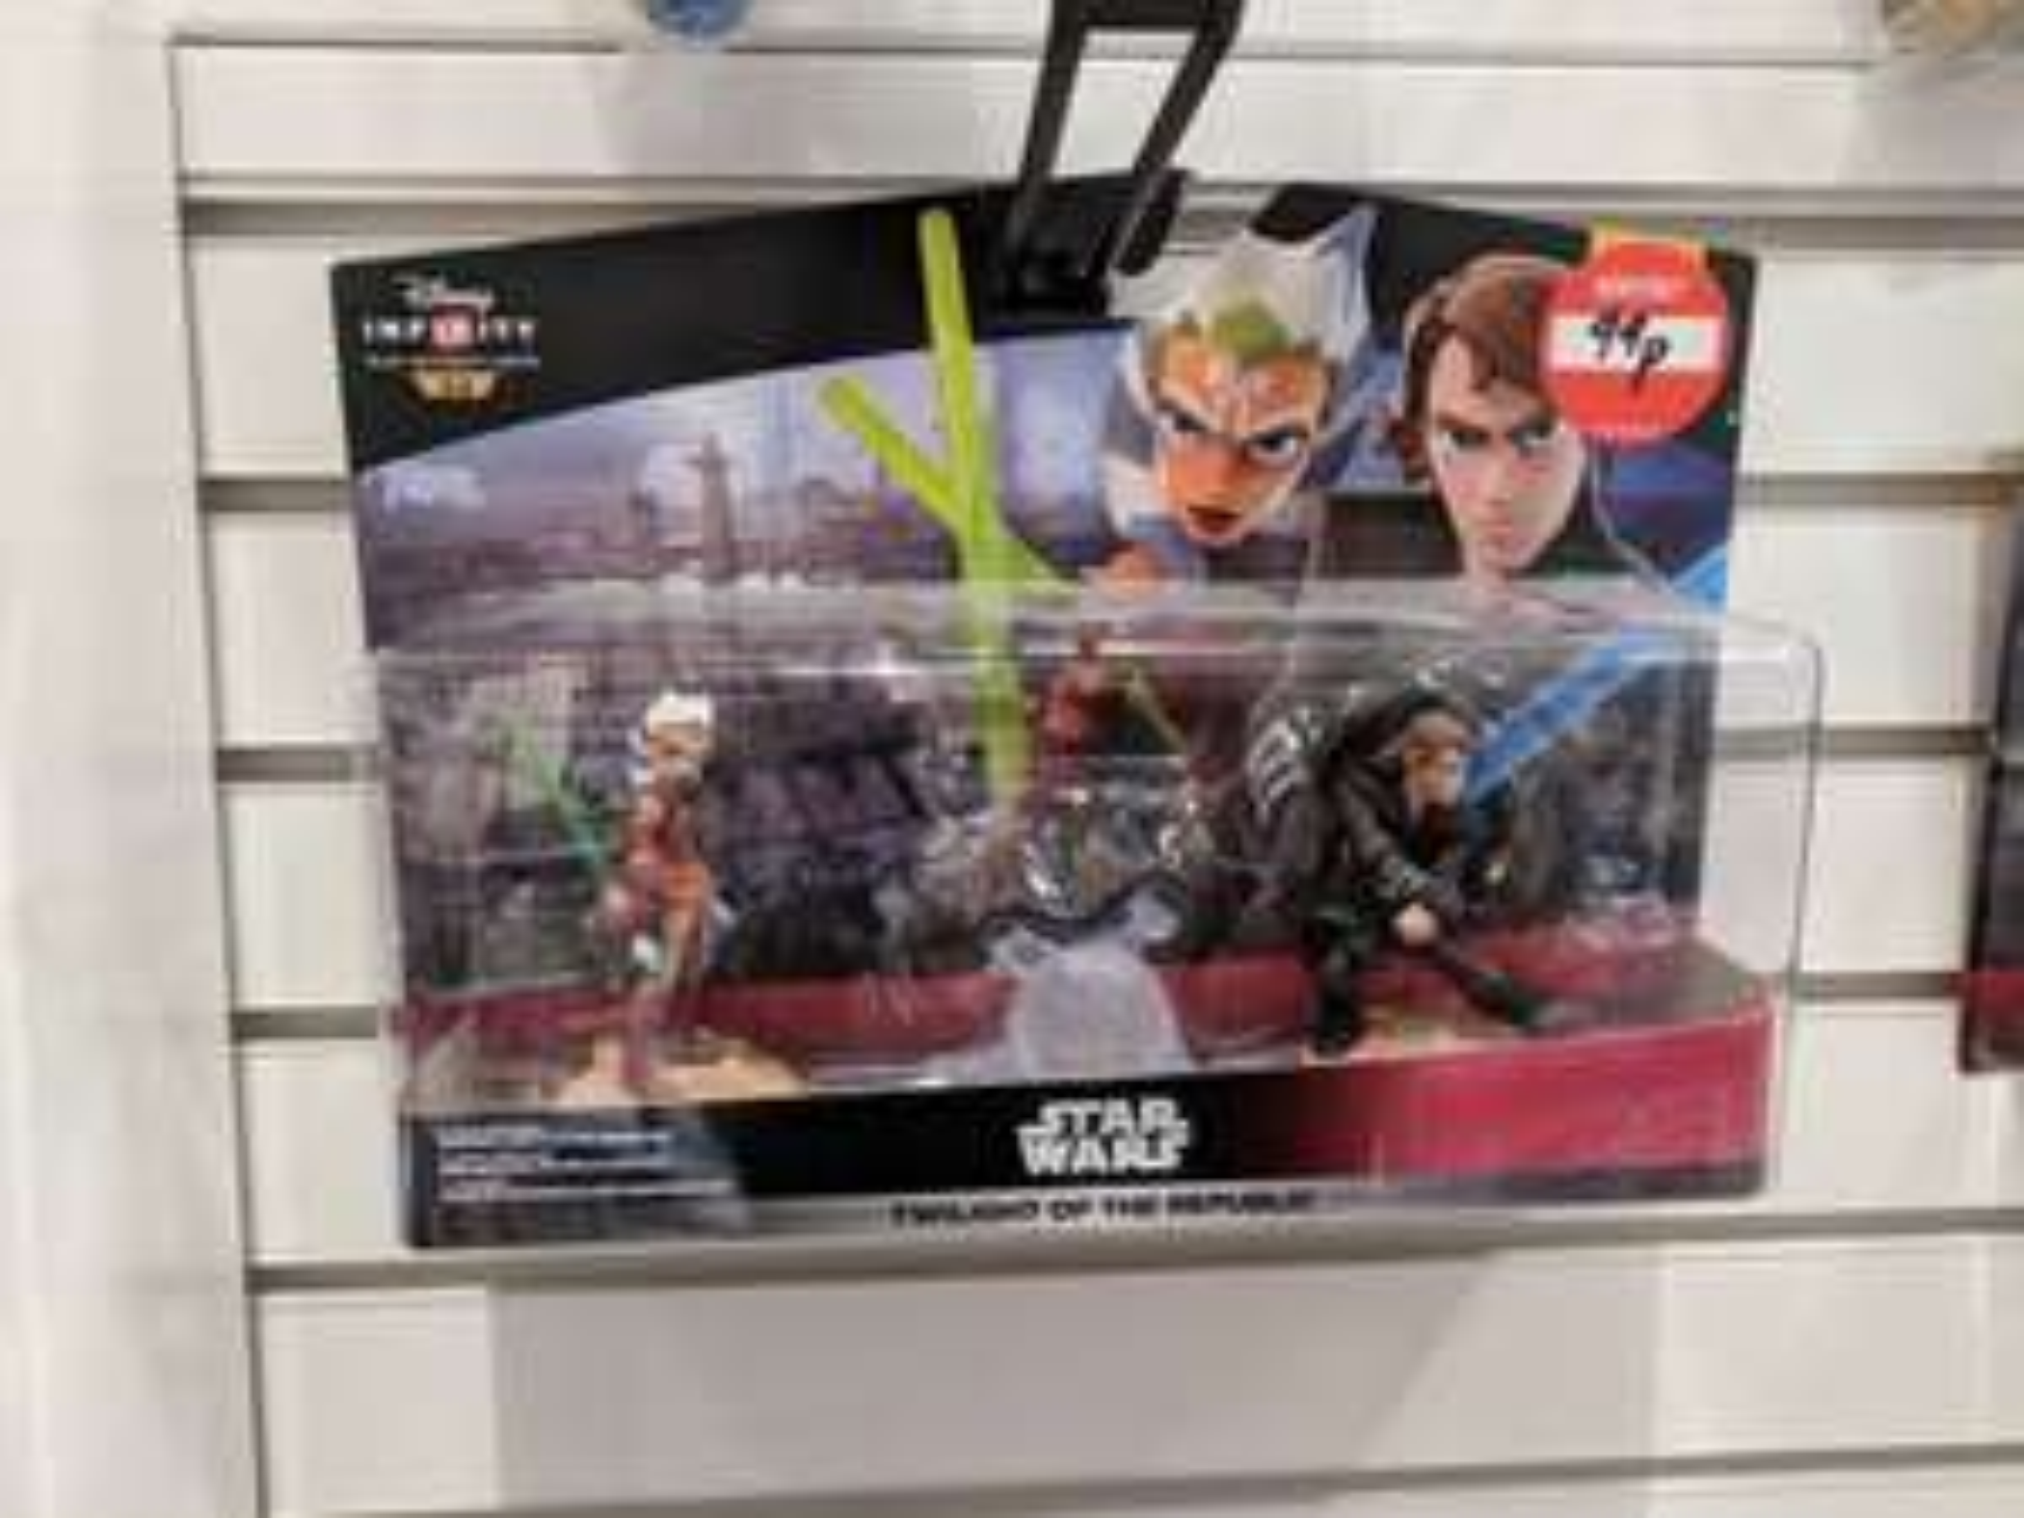 Disney Infinity 3.0 Star Wars - Twilight of the Republic Play Set 99p @ GAME